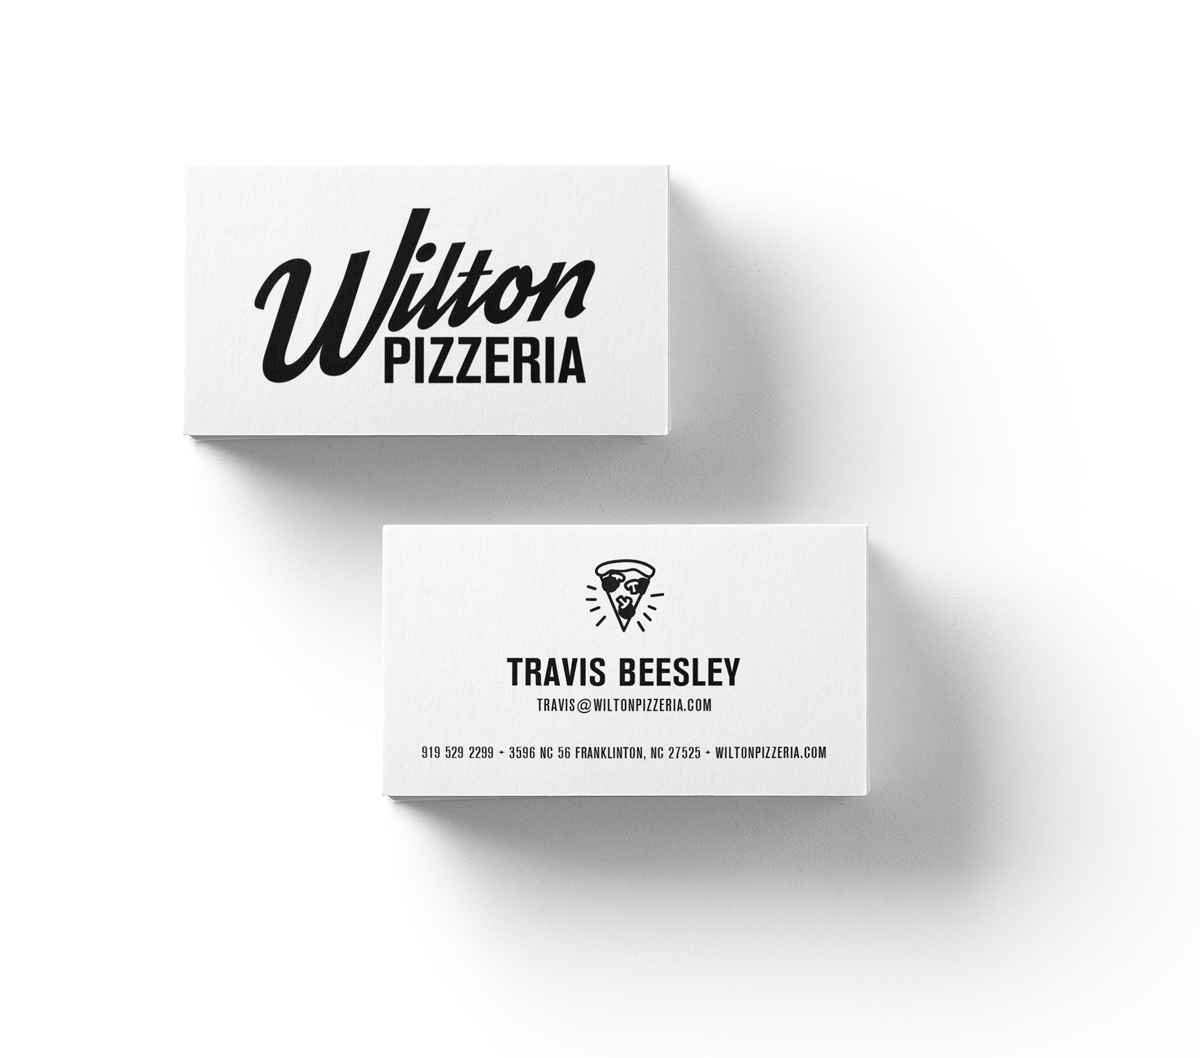 businesscard-mockup.png